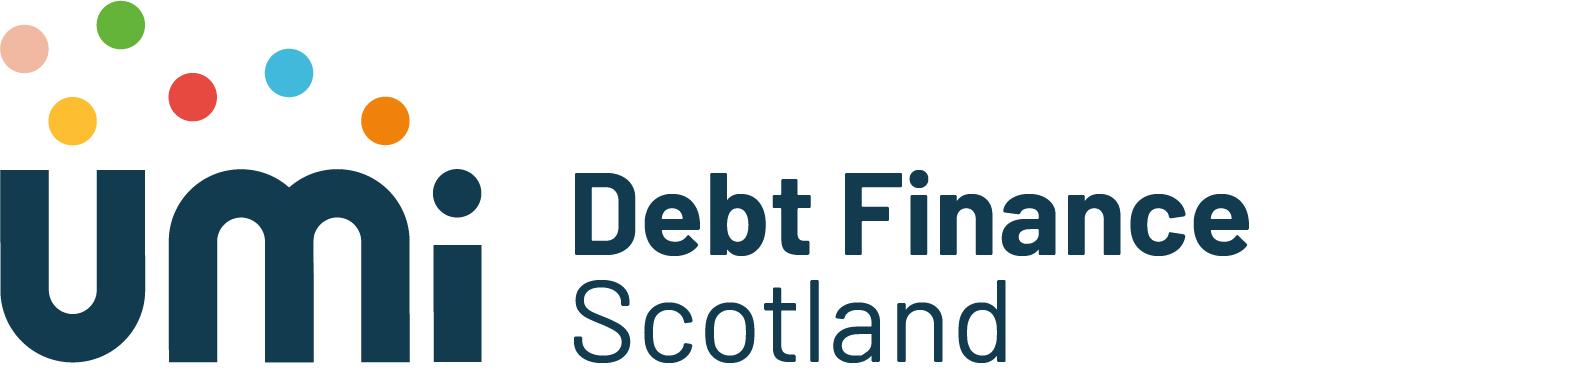 Umi Logo_Debt Finance